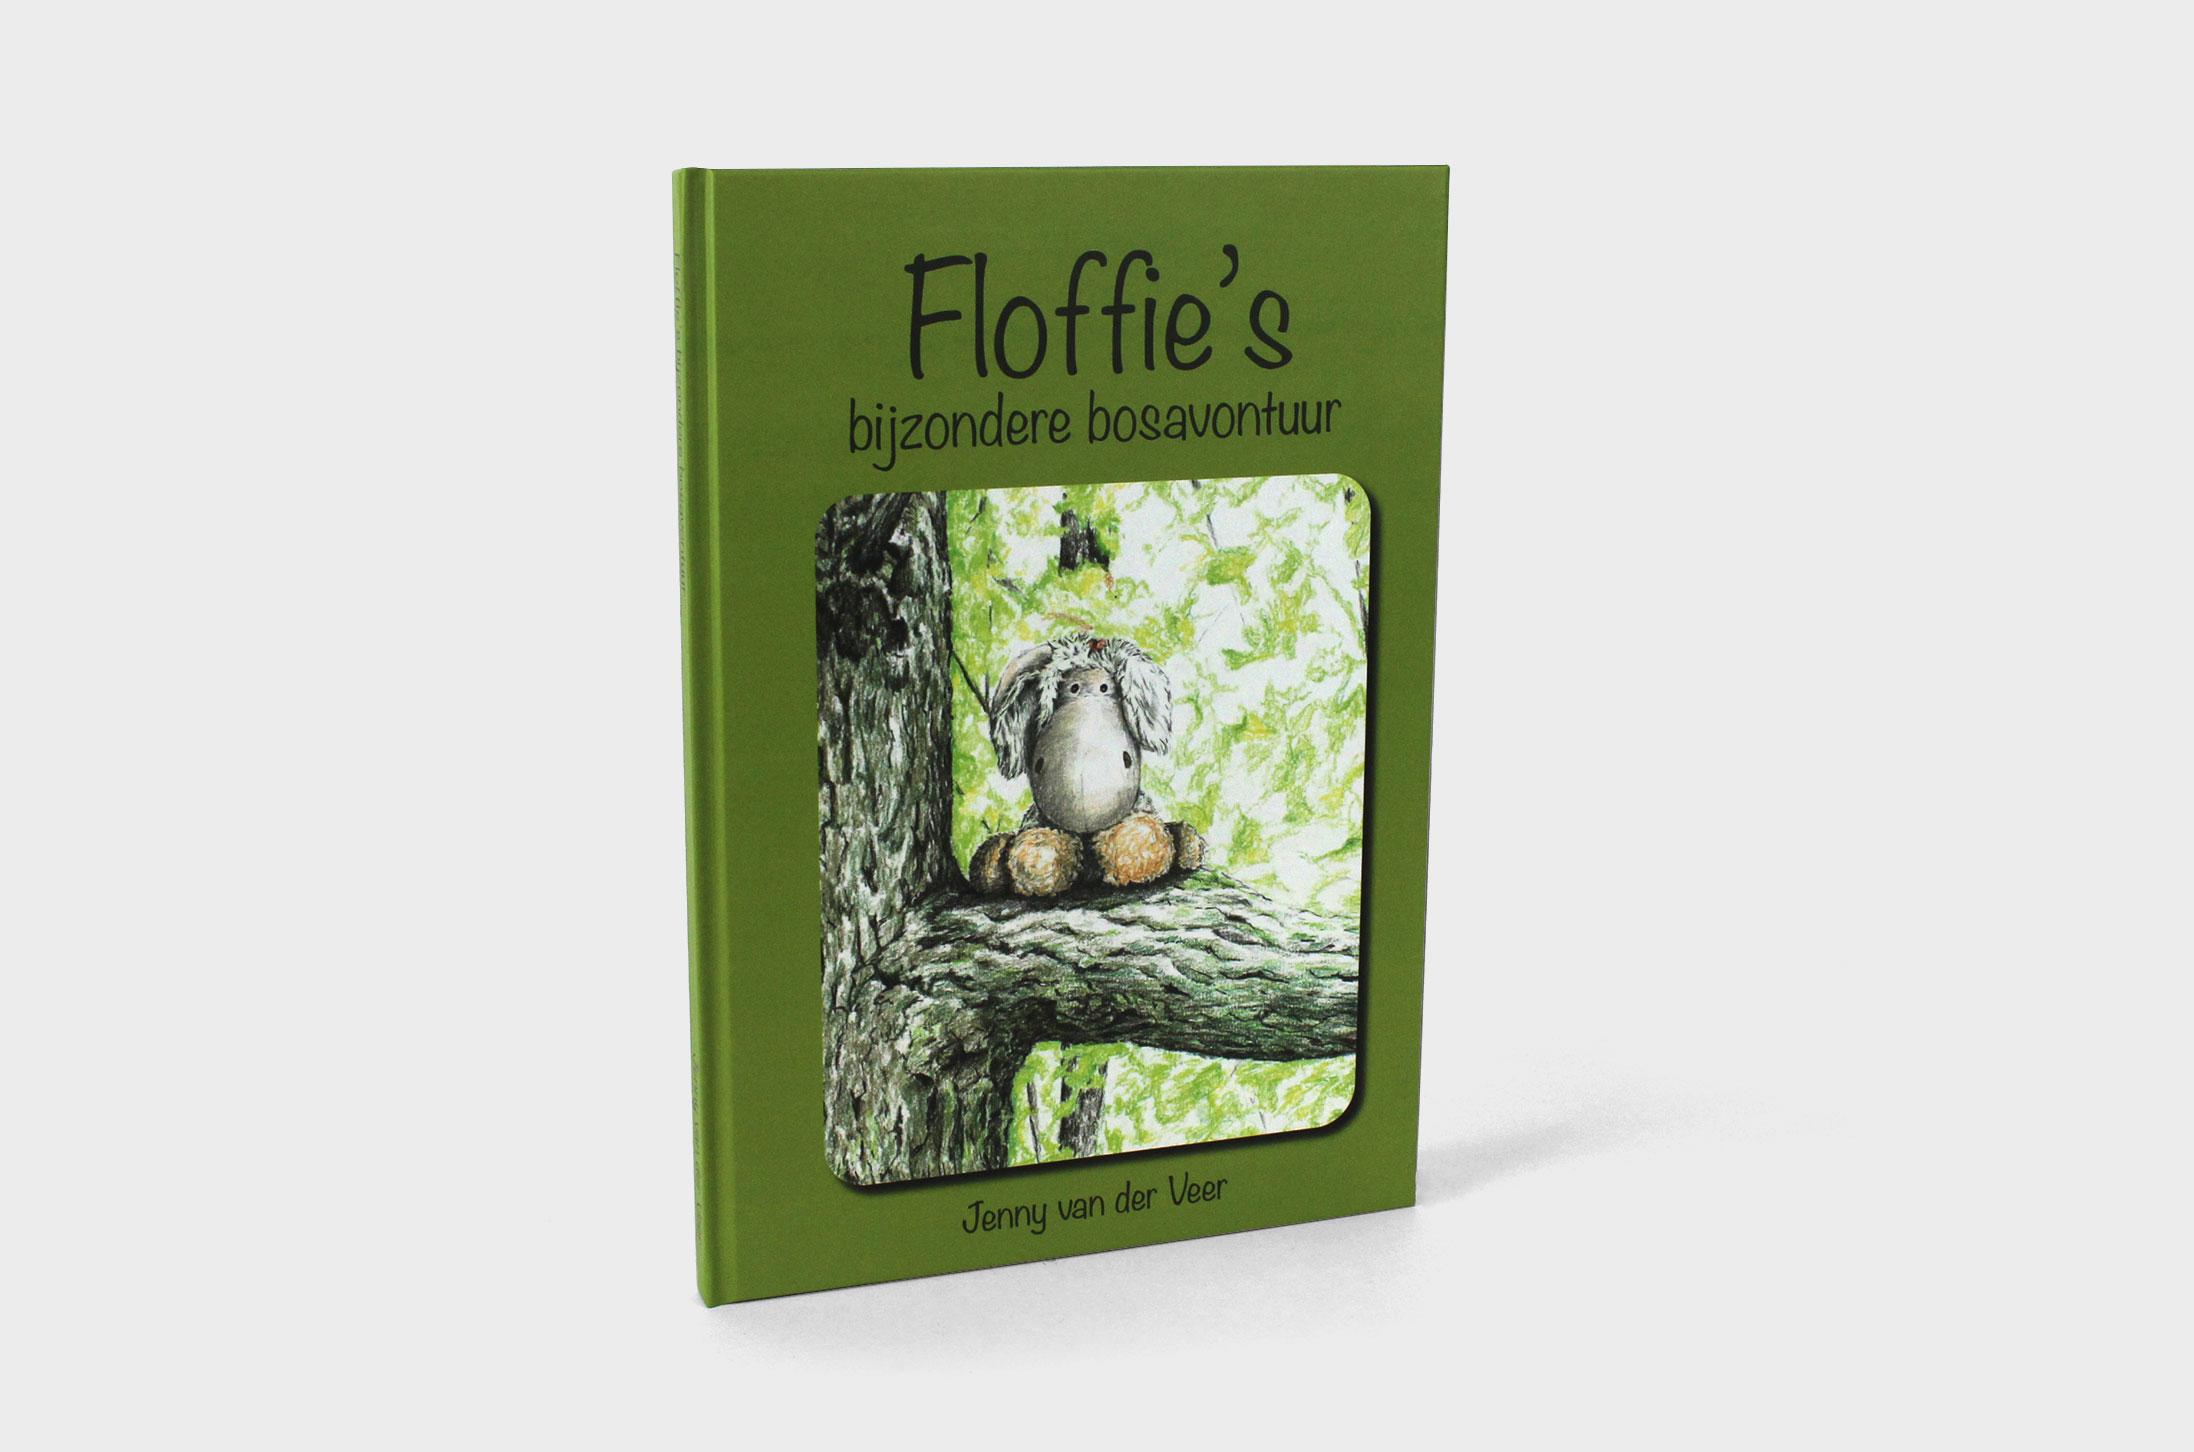 Floffie's bijzondere bosavontuur